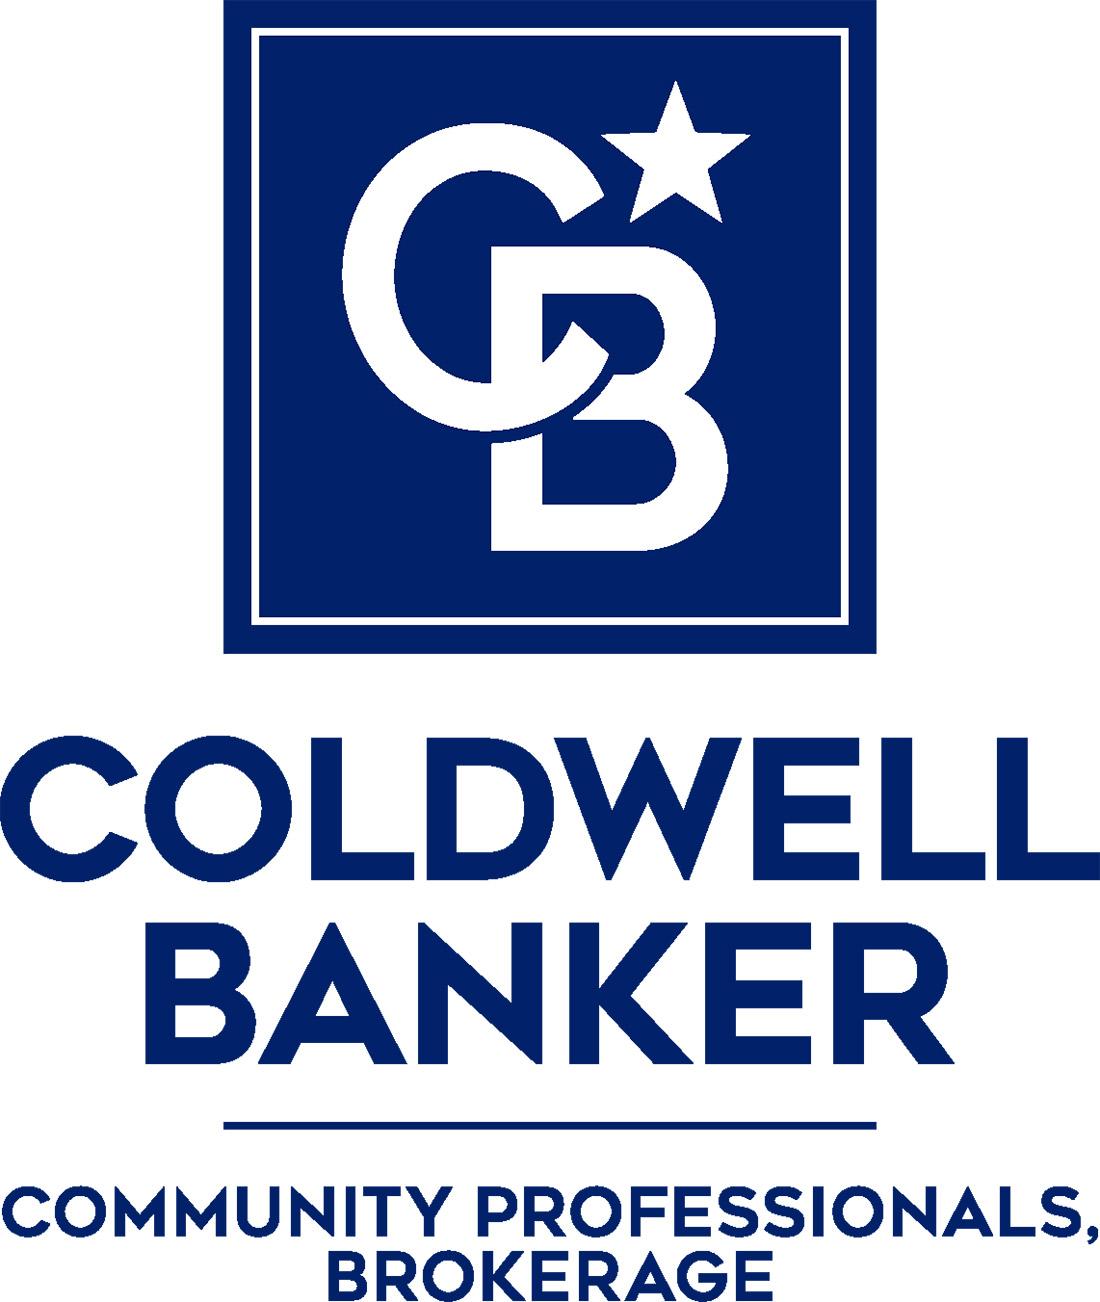 Anna Cumming - Coldwell Banker Community Professionals Logo